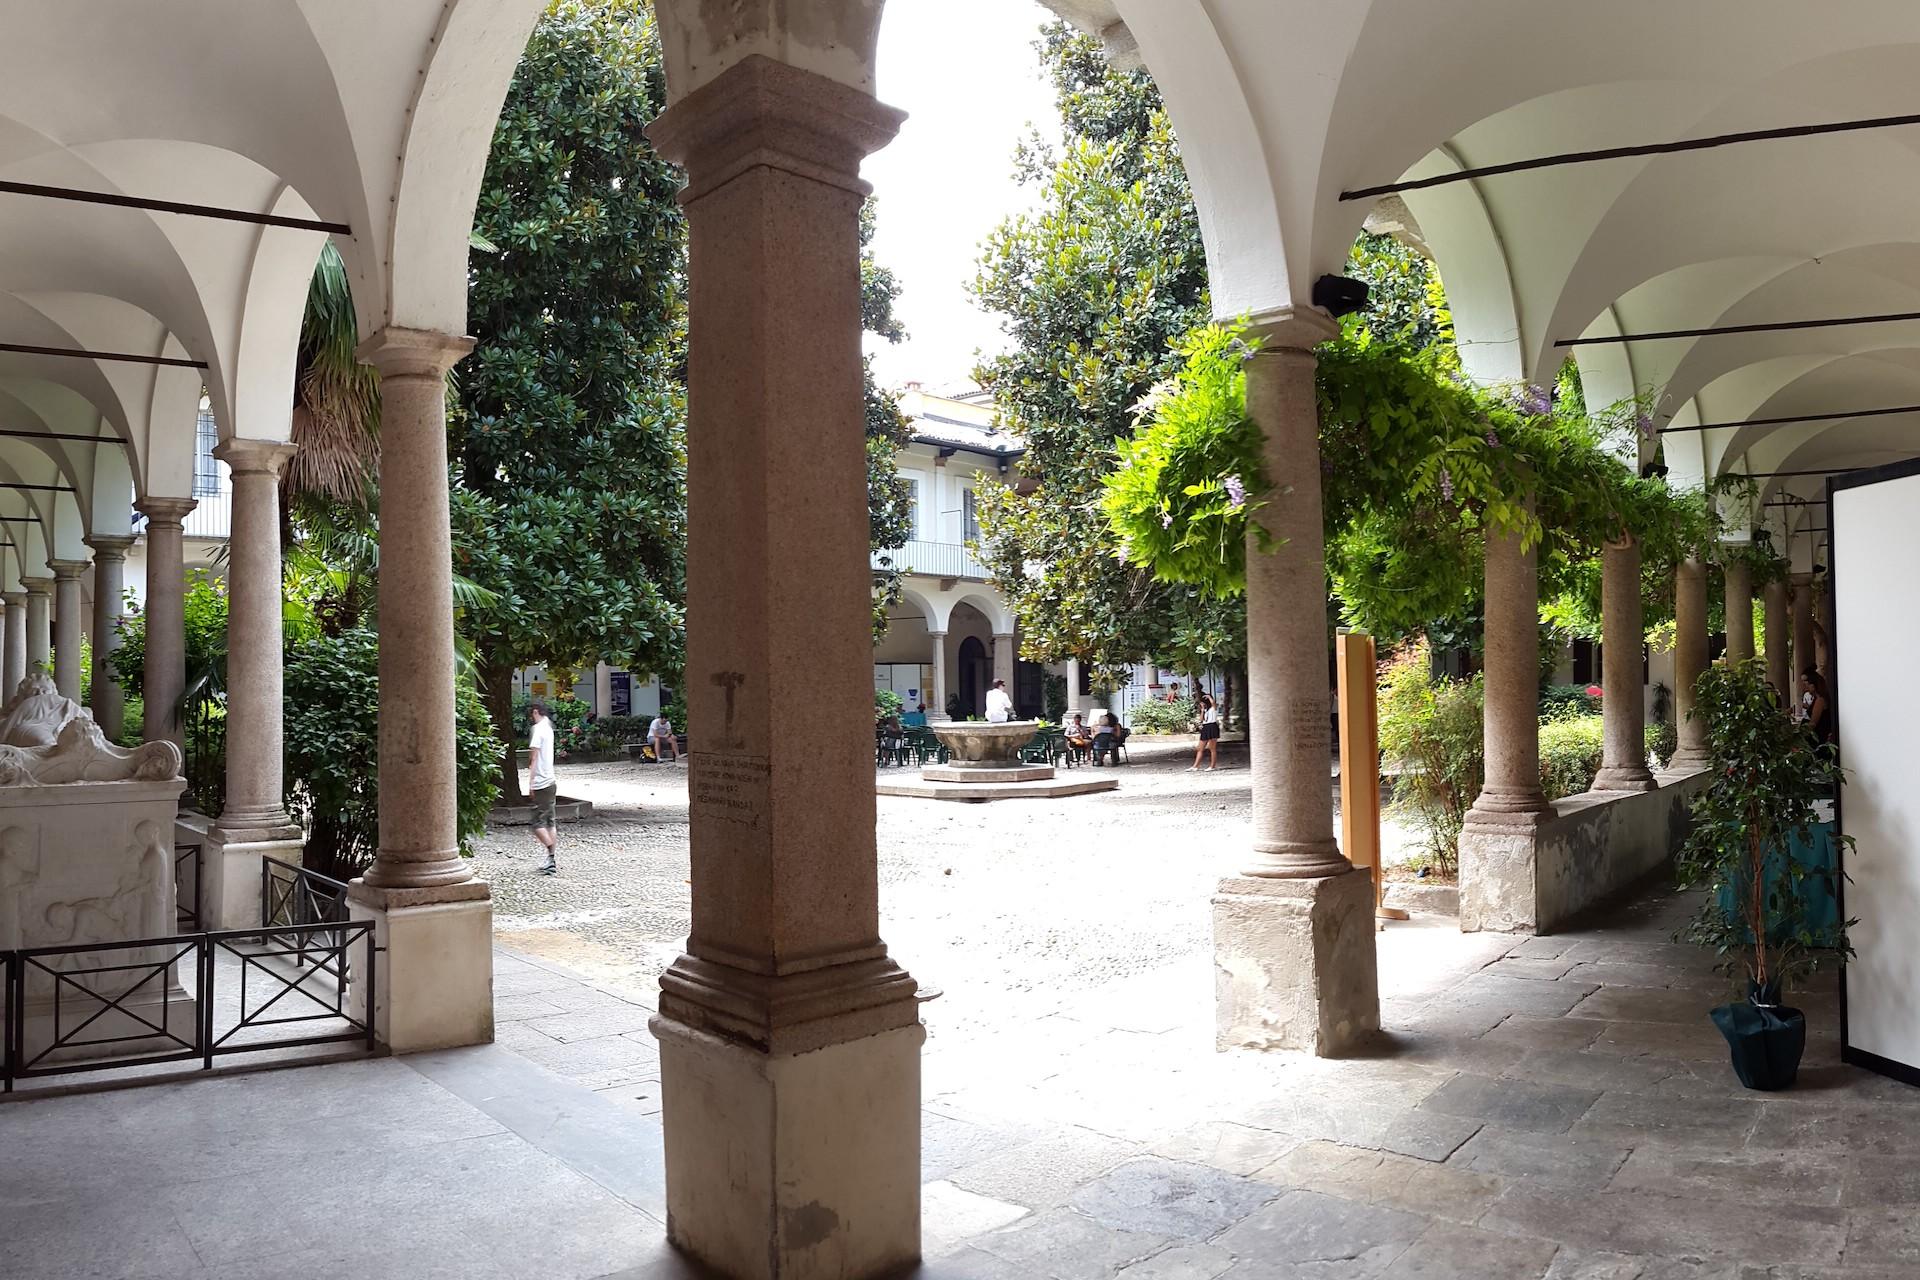 01-Univ-Pavia-Centrale-Cortile-delle-magnolie